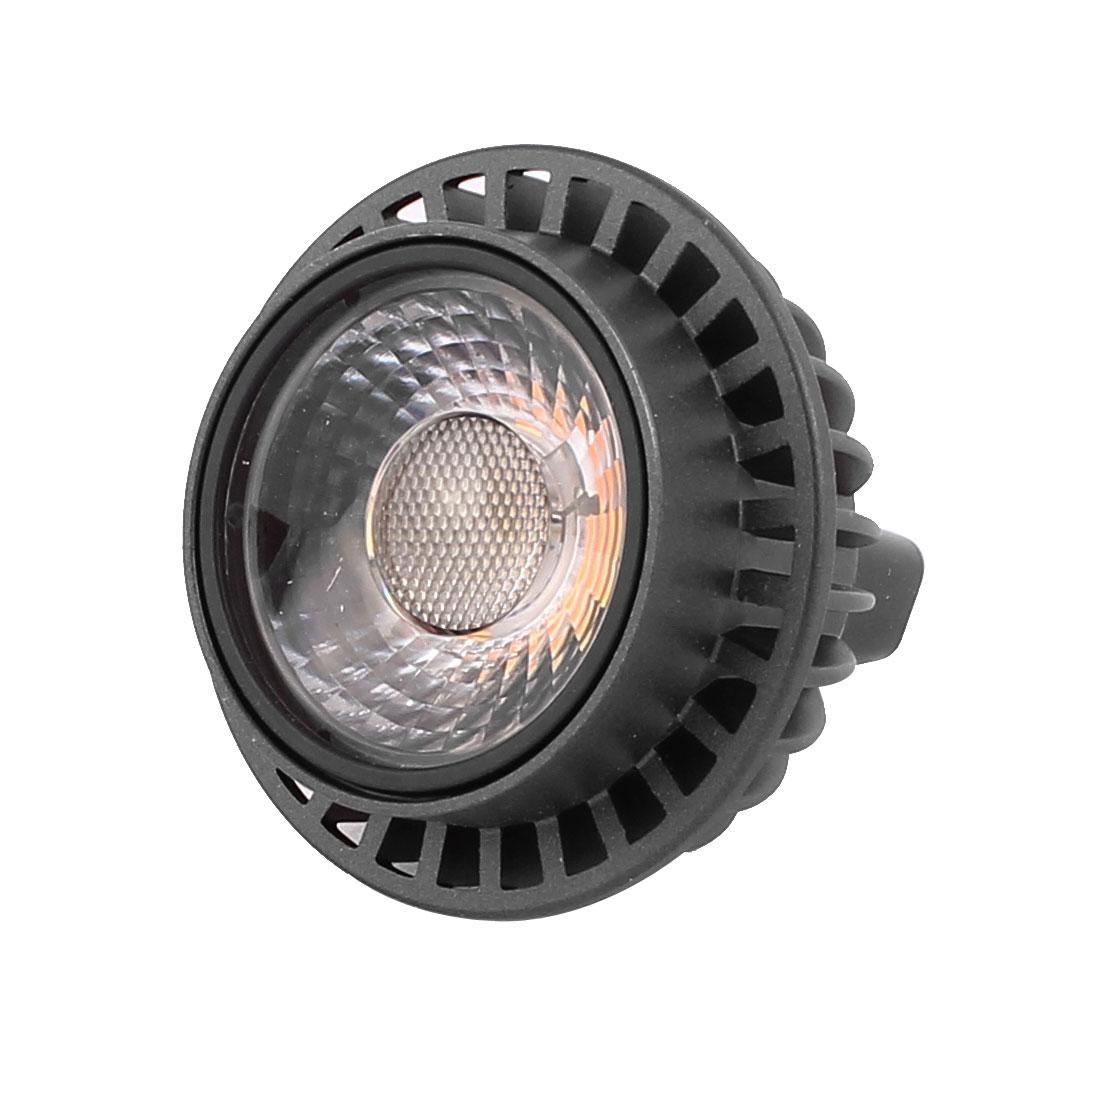 DC12V 3W MR16 COB LED Spotlight Lamp Bulb Downlight Cylinder Warm White